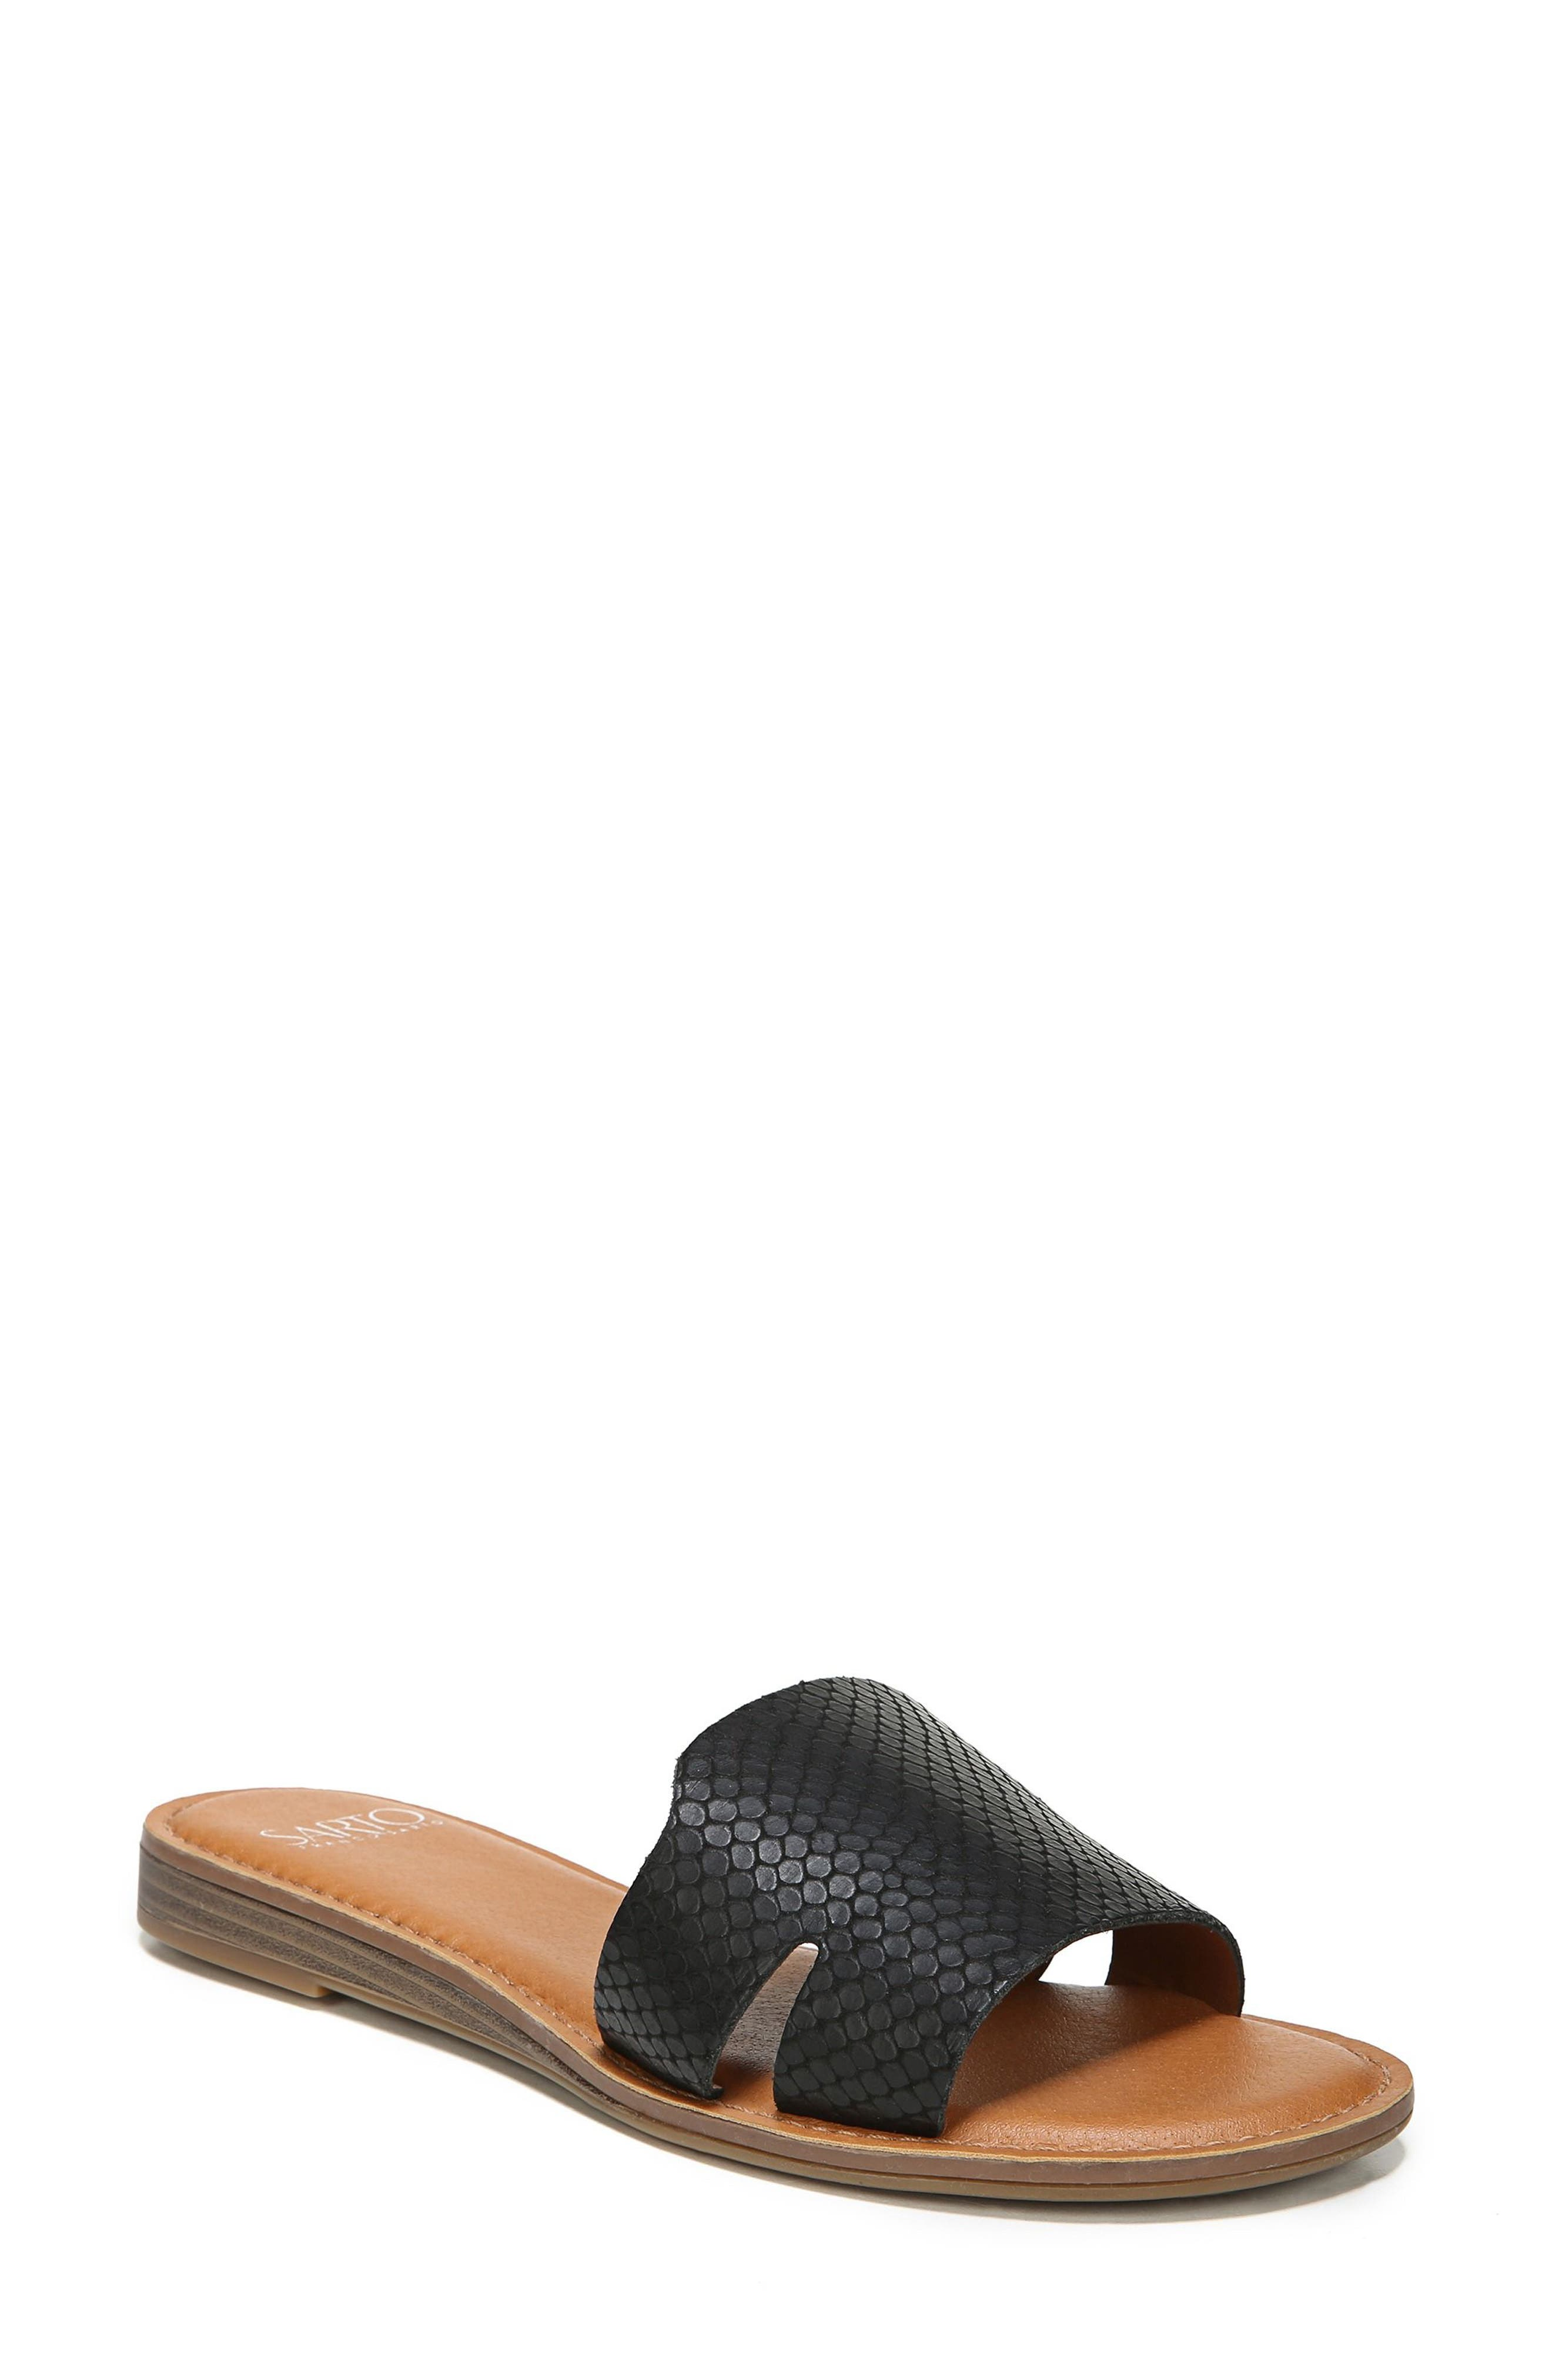 Sarto By Franco Sarto Ginelle Slide Sandal